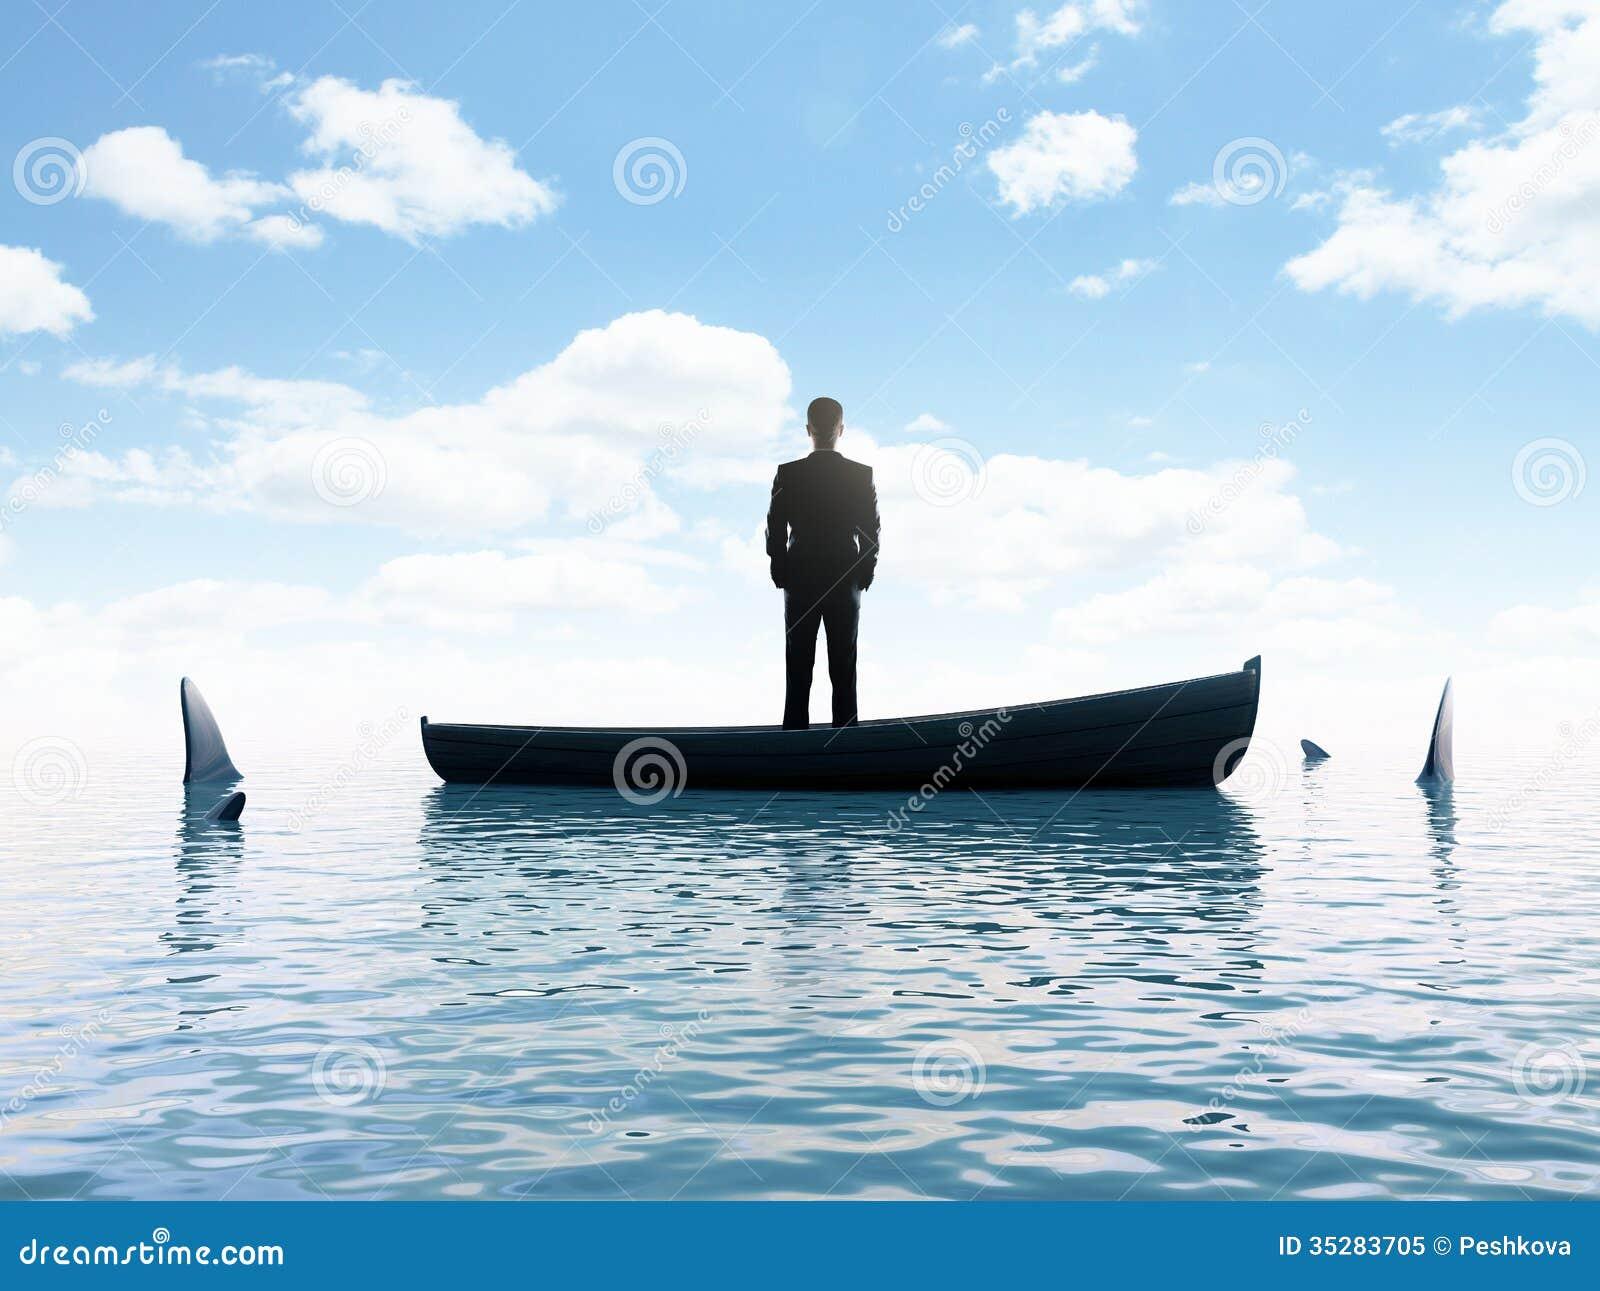 Businessman and sharks stock illustration. Illustration of manager - 35283705